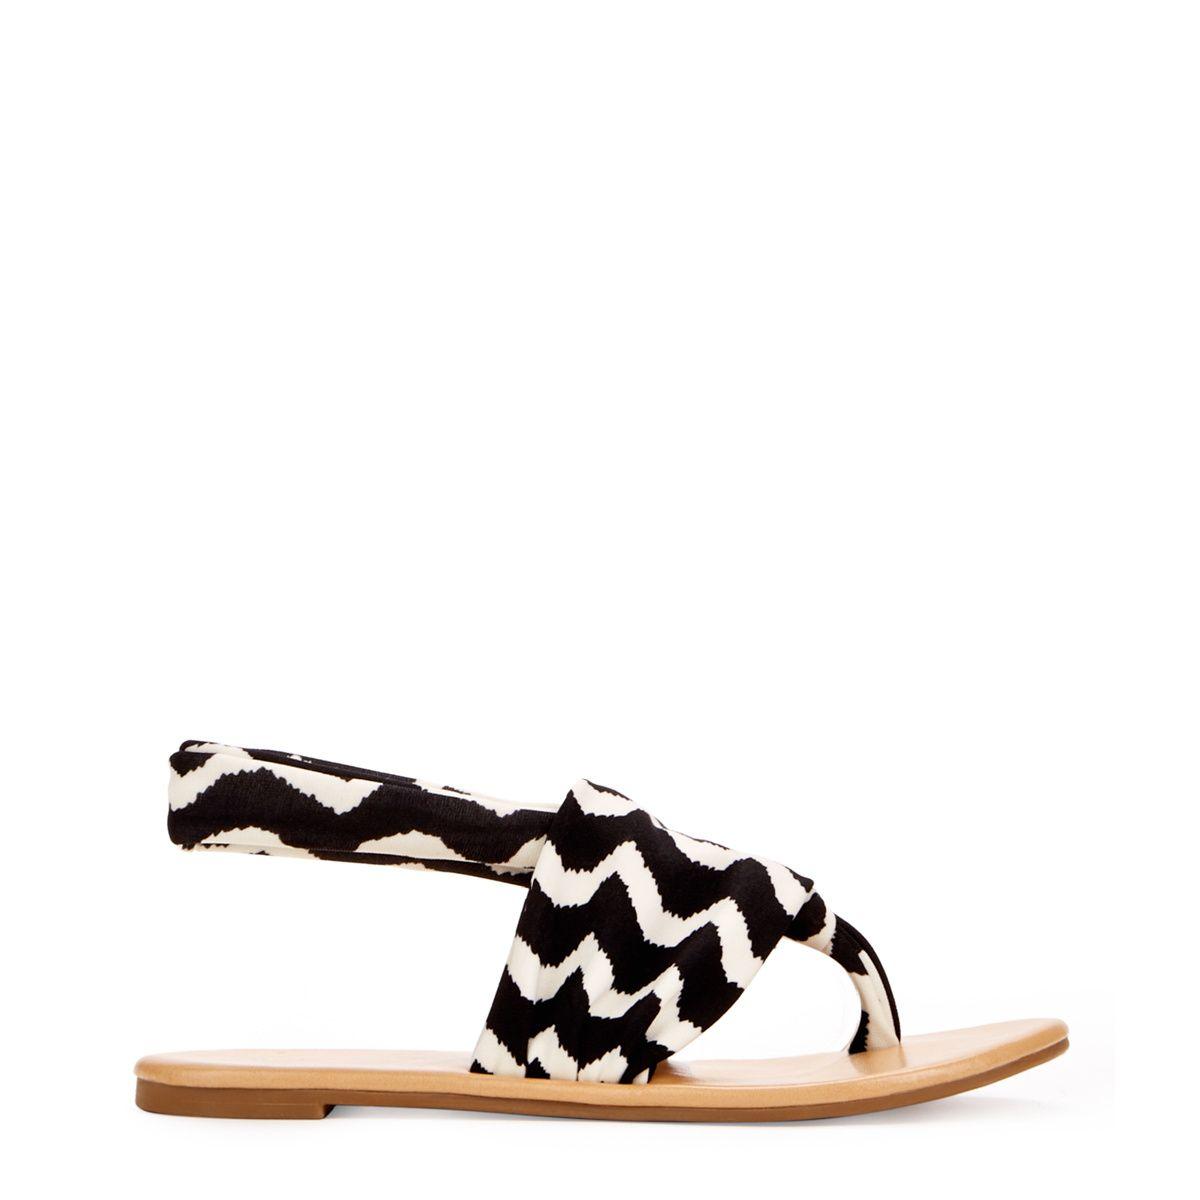 Saqui - ShoeDazzle